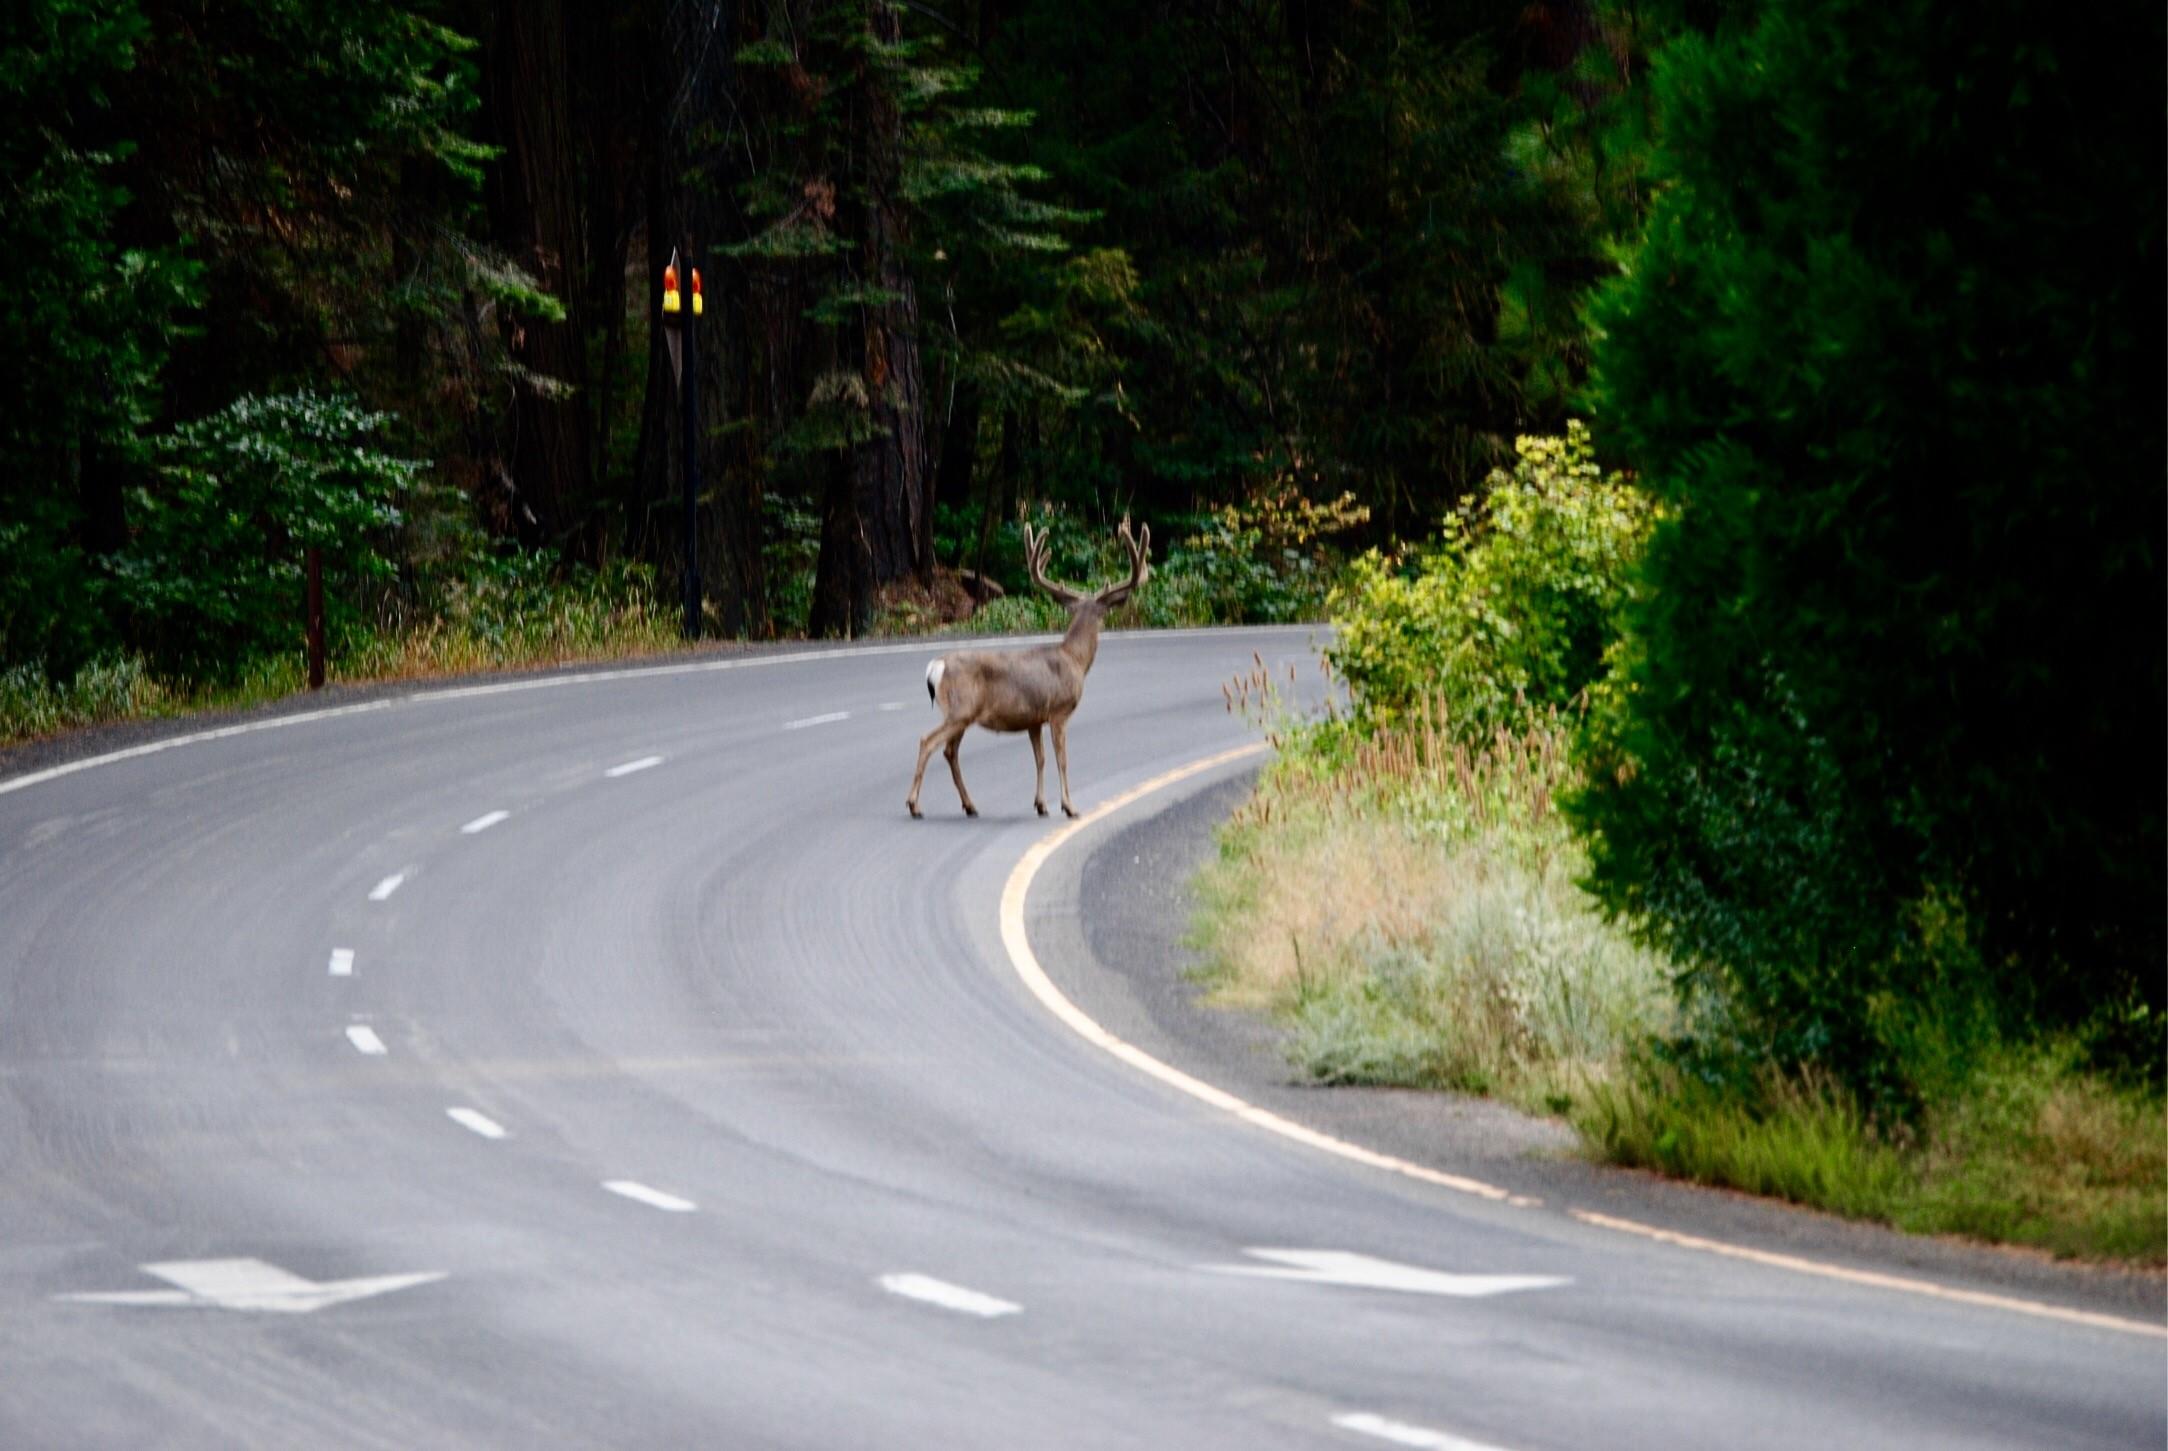 A buck in velvet, crossing the road near El Capitan.Yosemite Valley, CA. August, 2017.